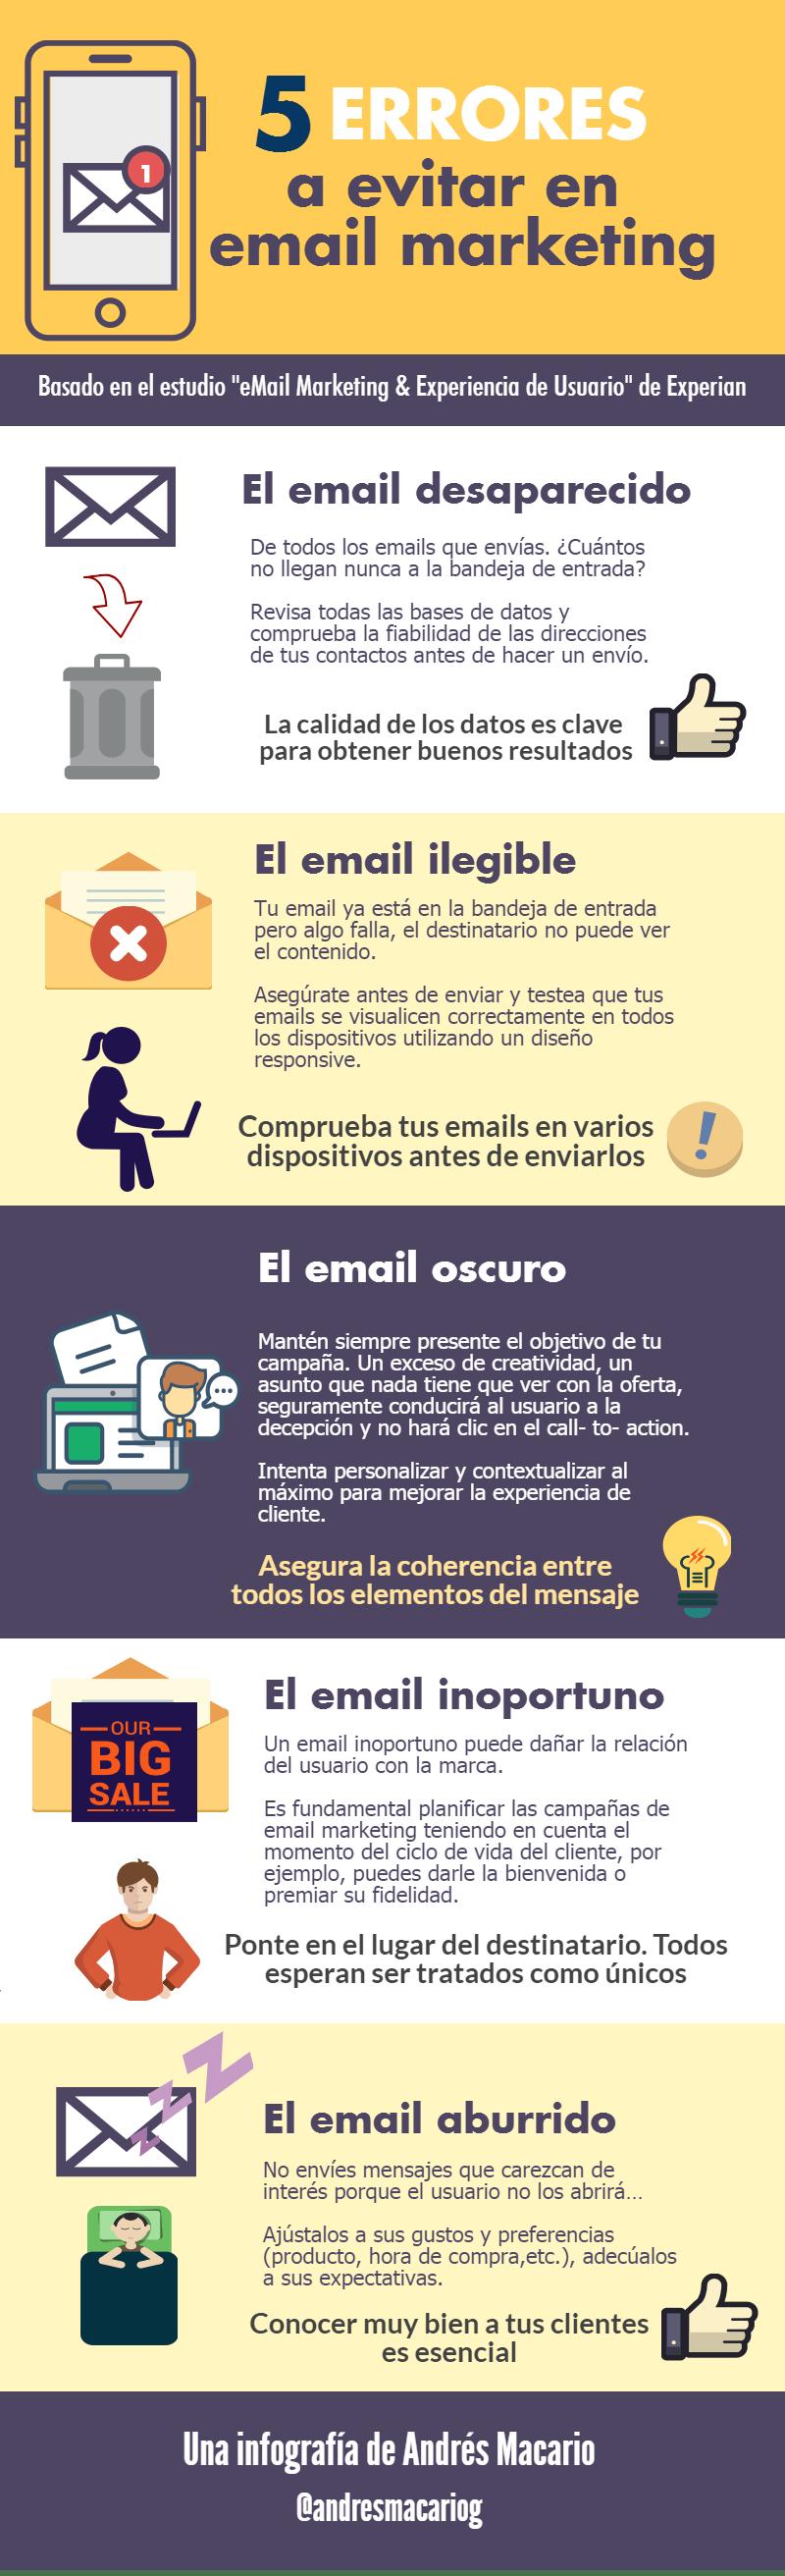 5 errores a evitar en email marketing - Infografia Andres Macario